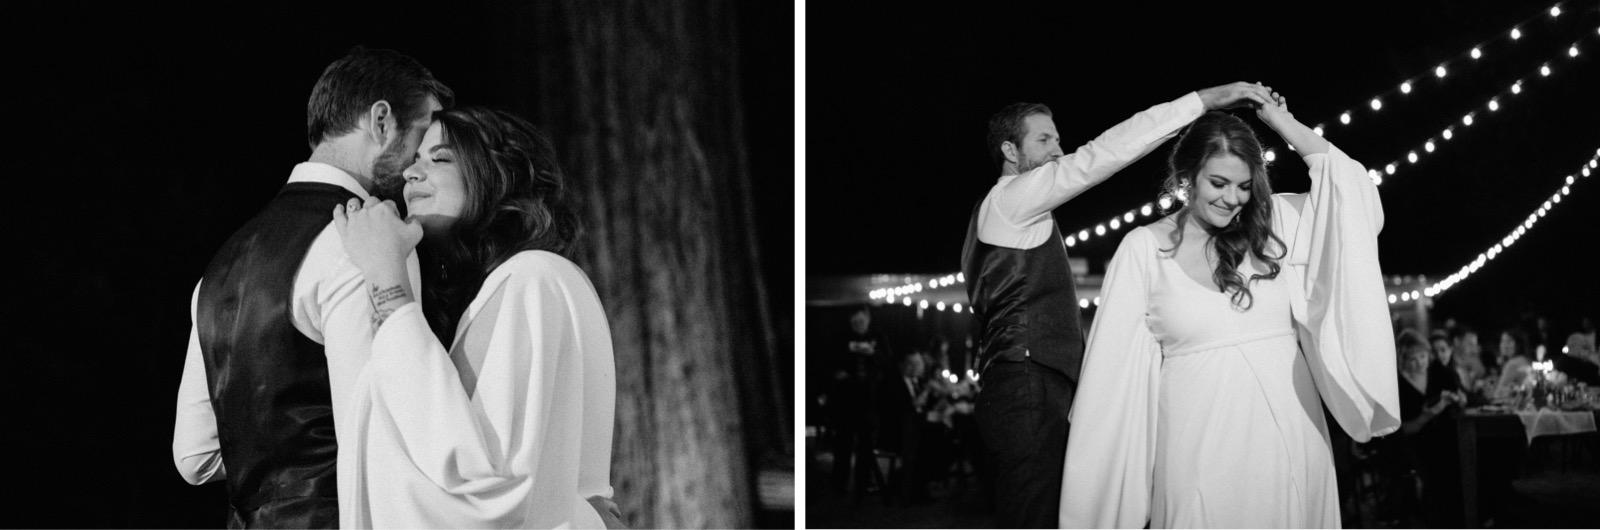 117_Emily & Jeff Wedding 1011_Emily & Jeff Wedding 1010_waterfall-lodge_couples_wedding_first-dance